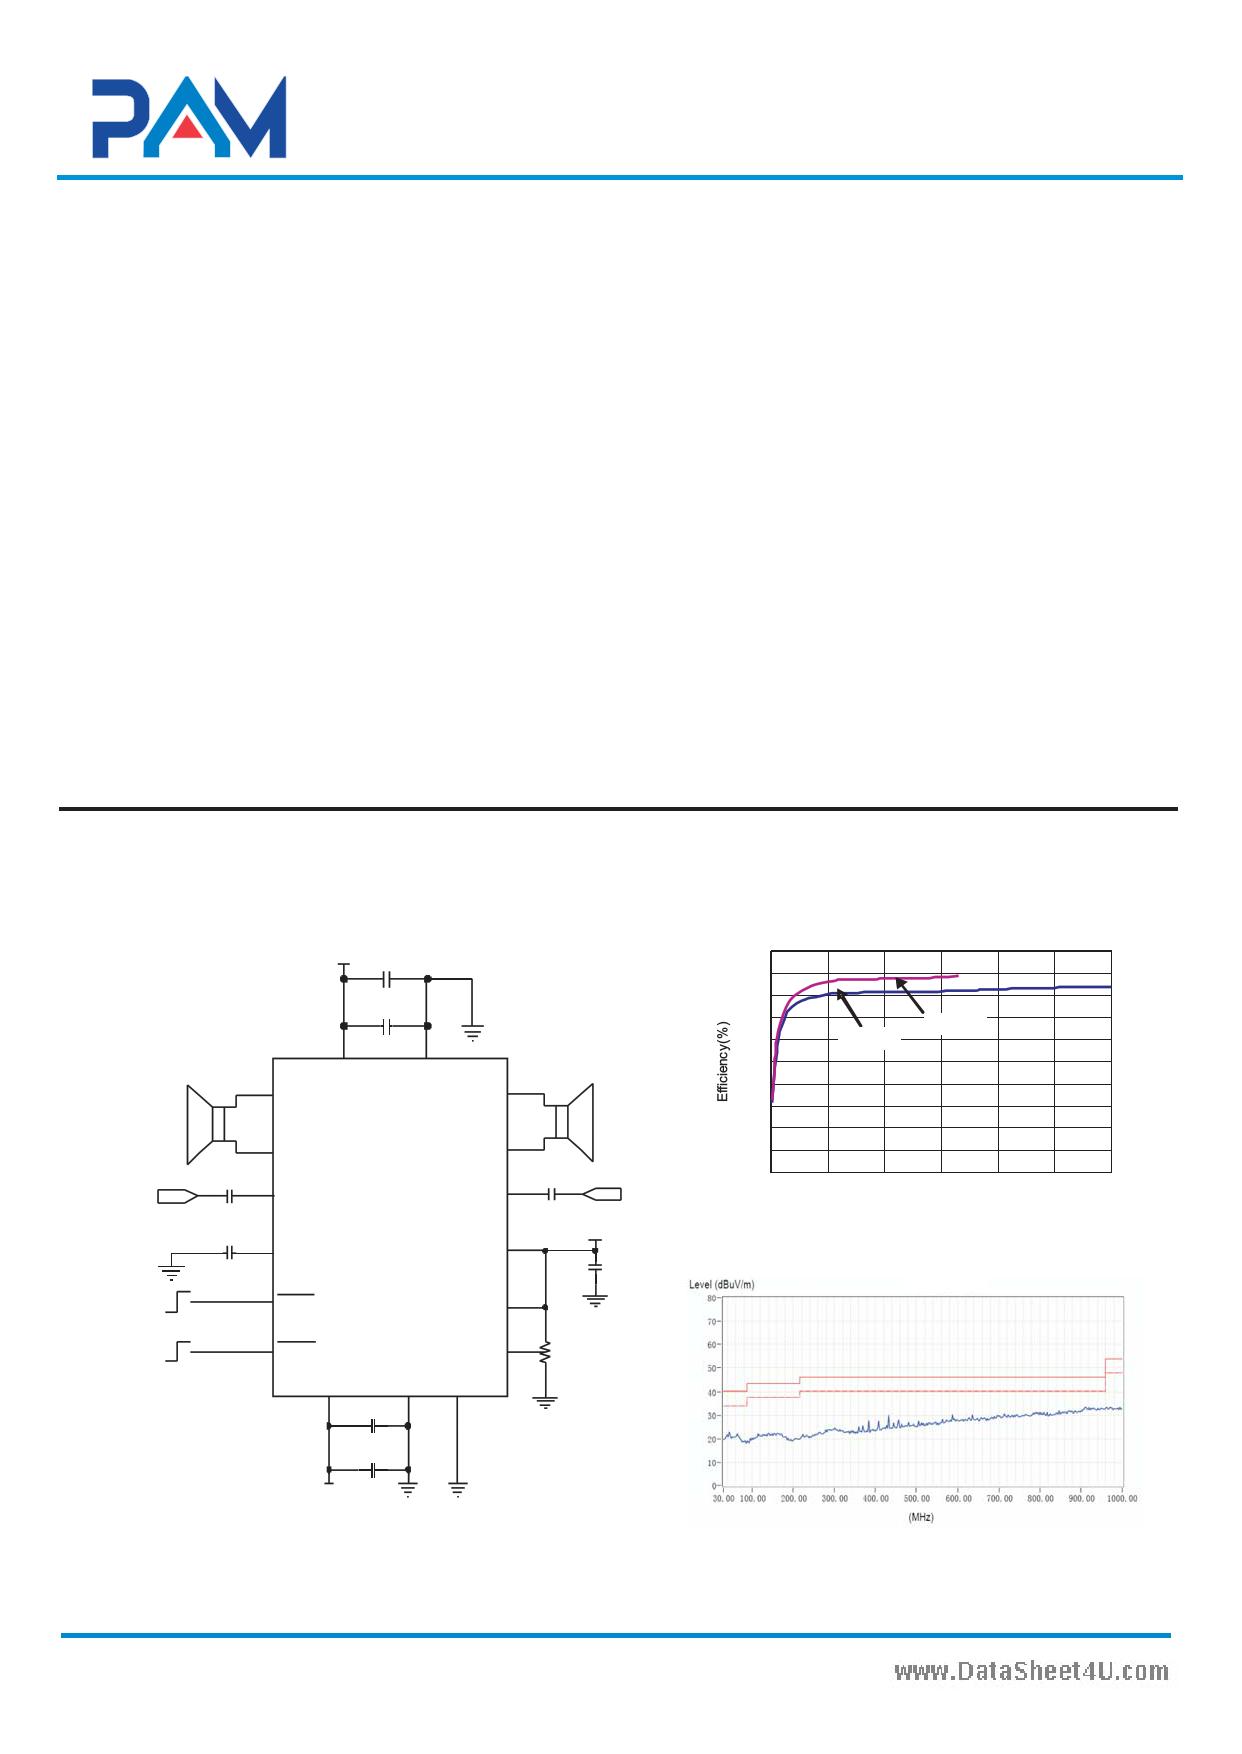 PAM8603M دیتاشیت PDF